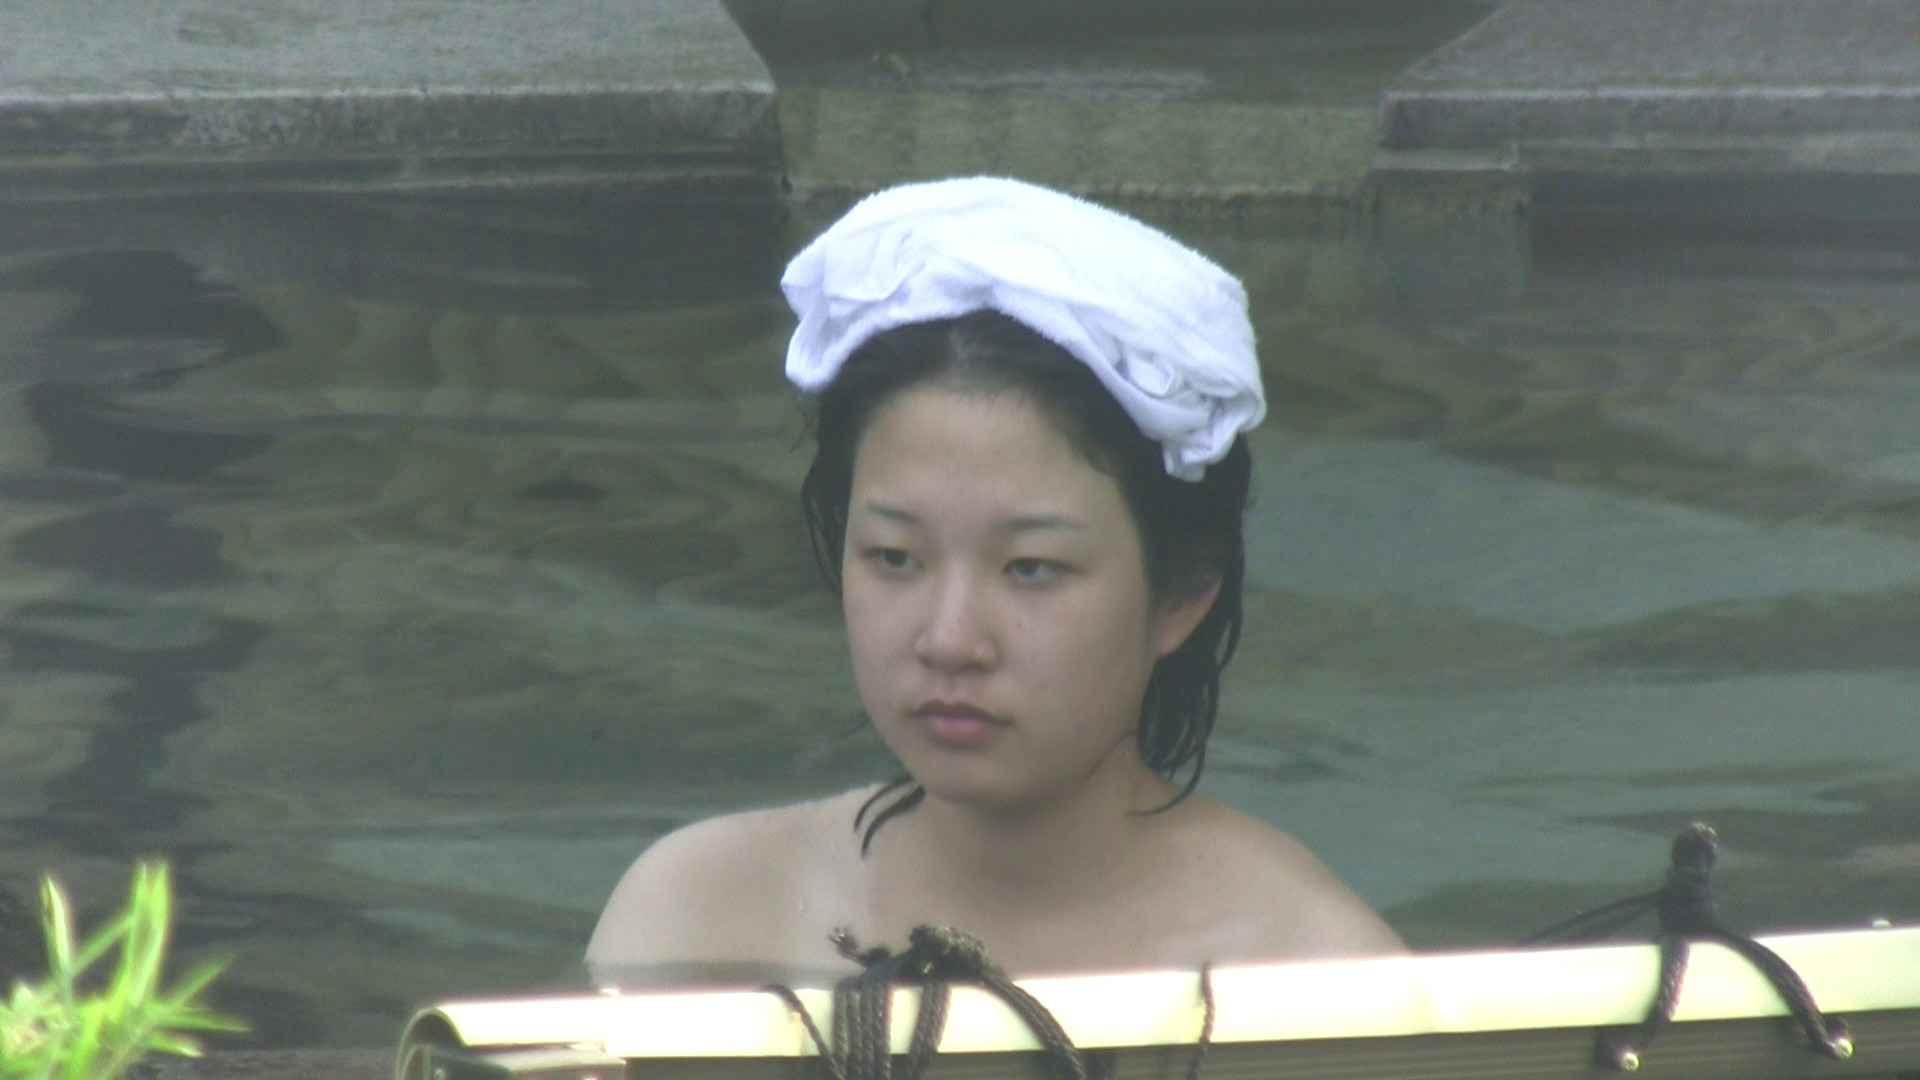 Aquaな露天風呂Vol.172 盗撮映像  113Pix 44